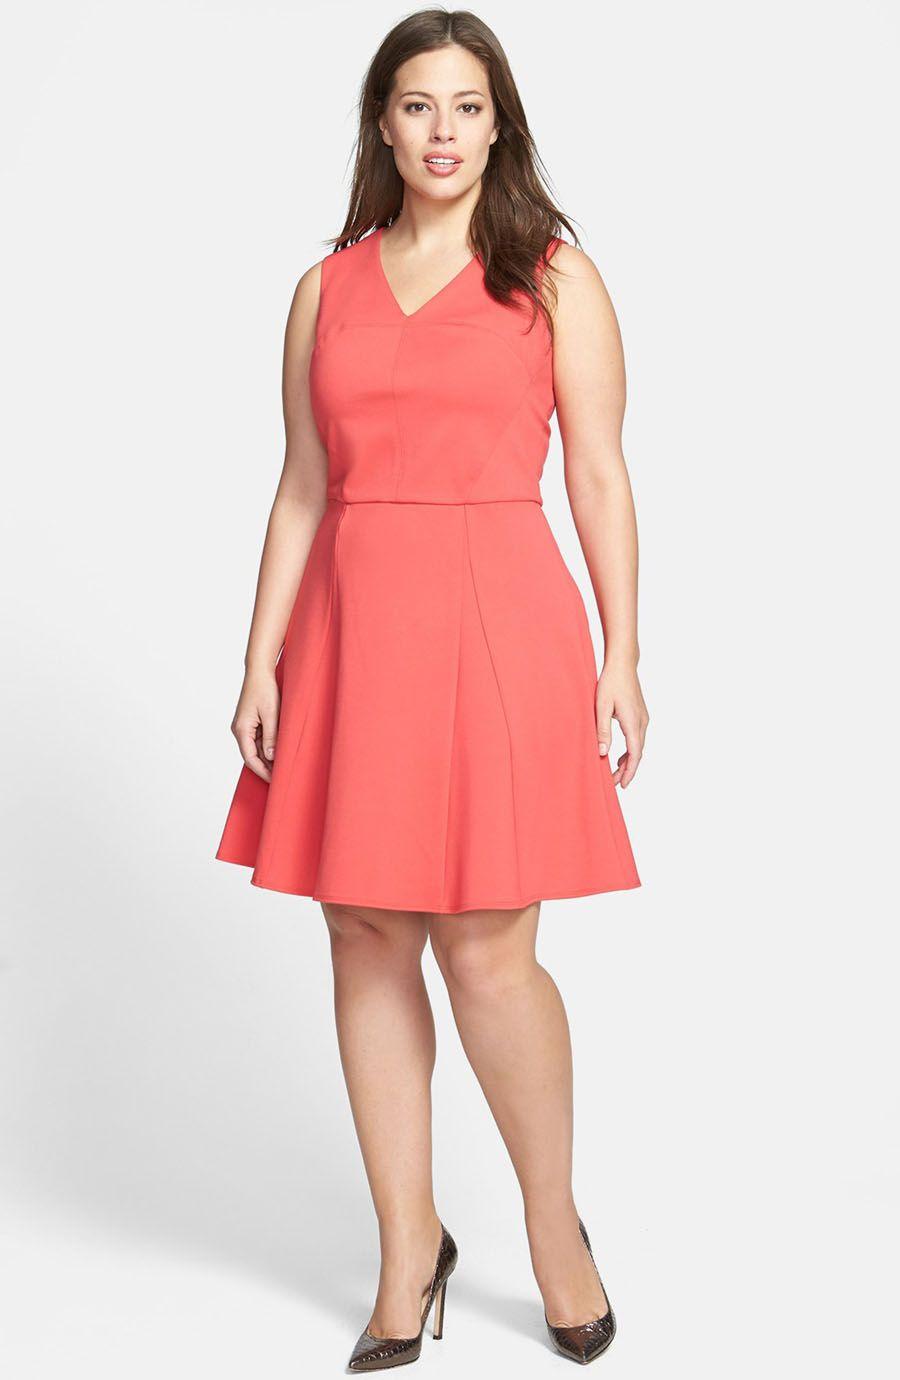 Timeless v-neck plus size short coral bridesmaid dress | vestidos ...